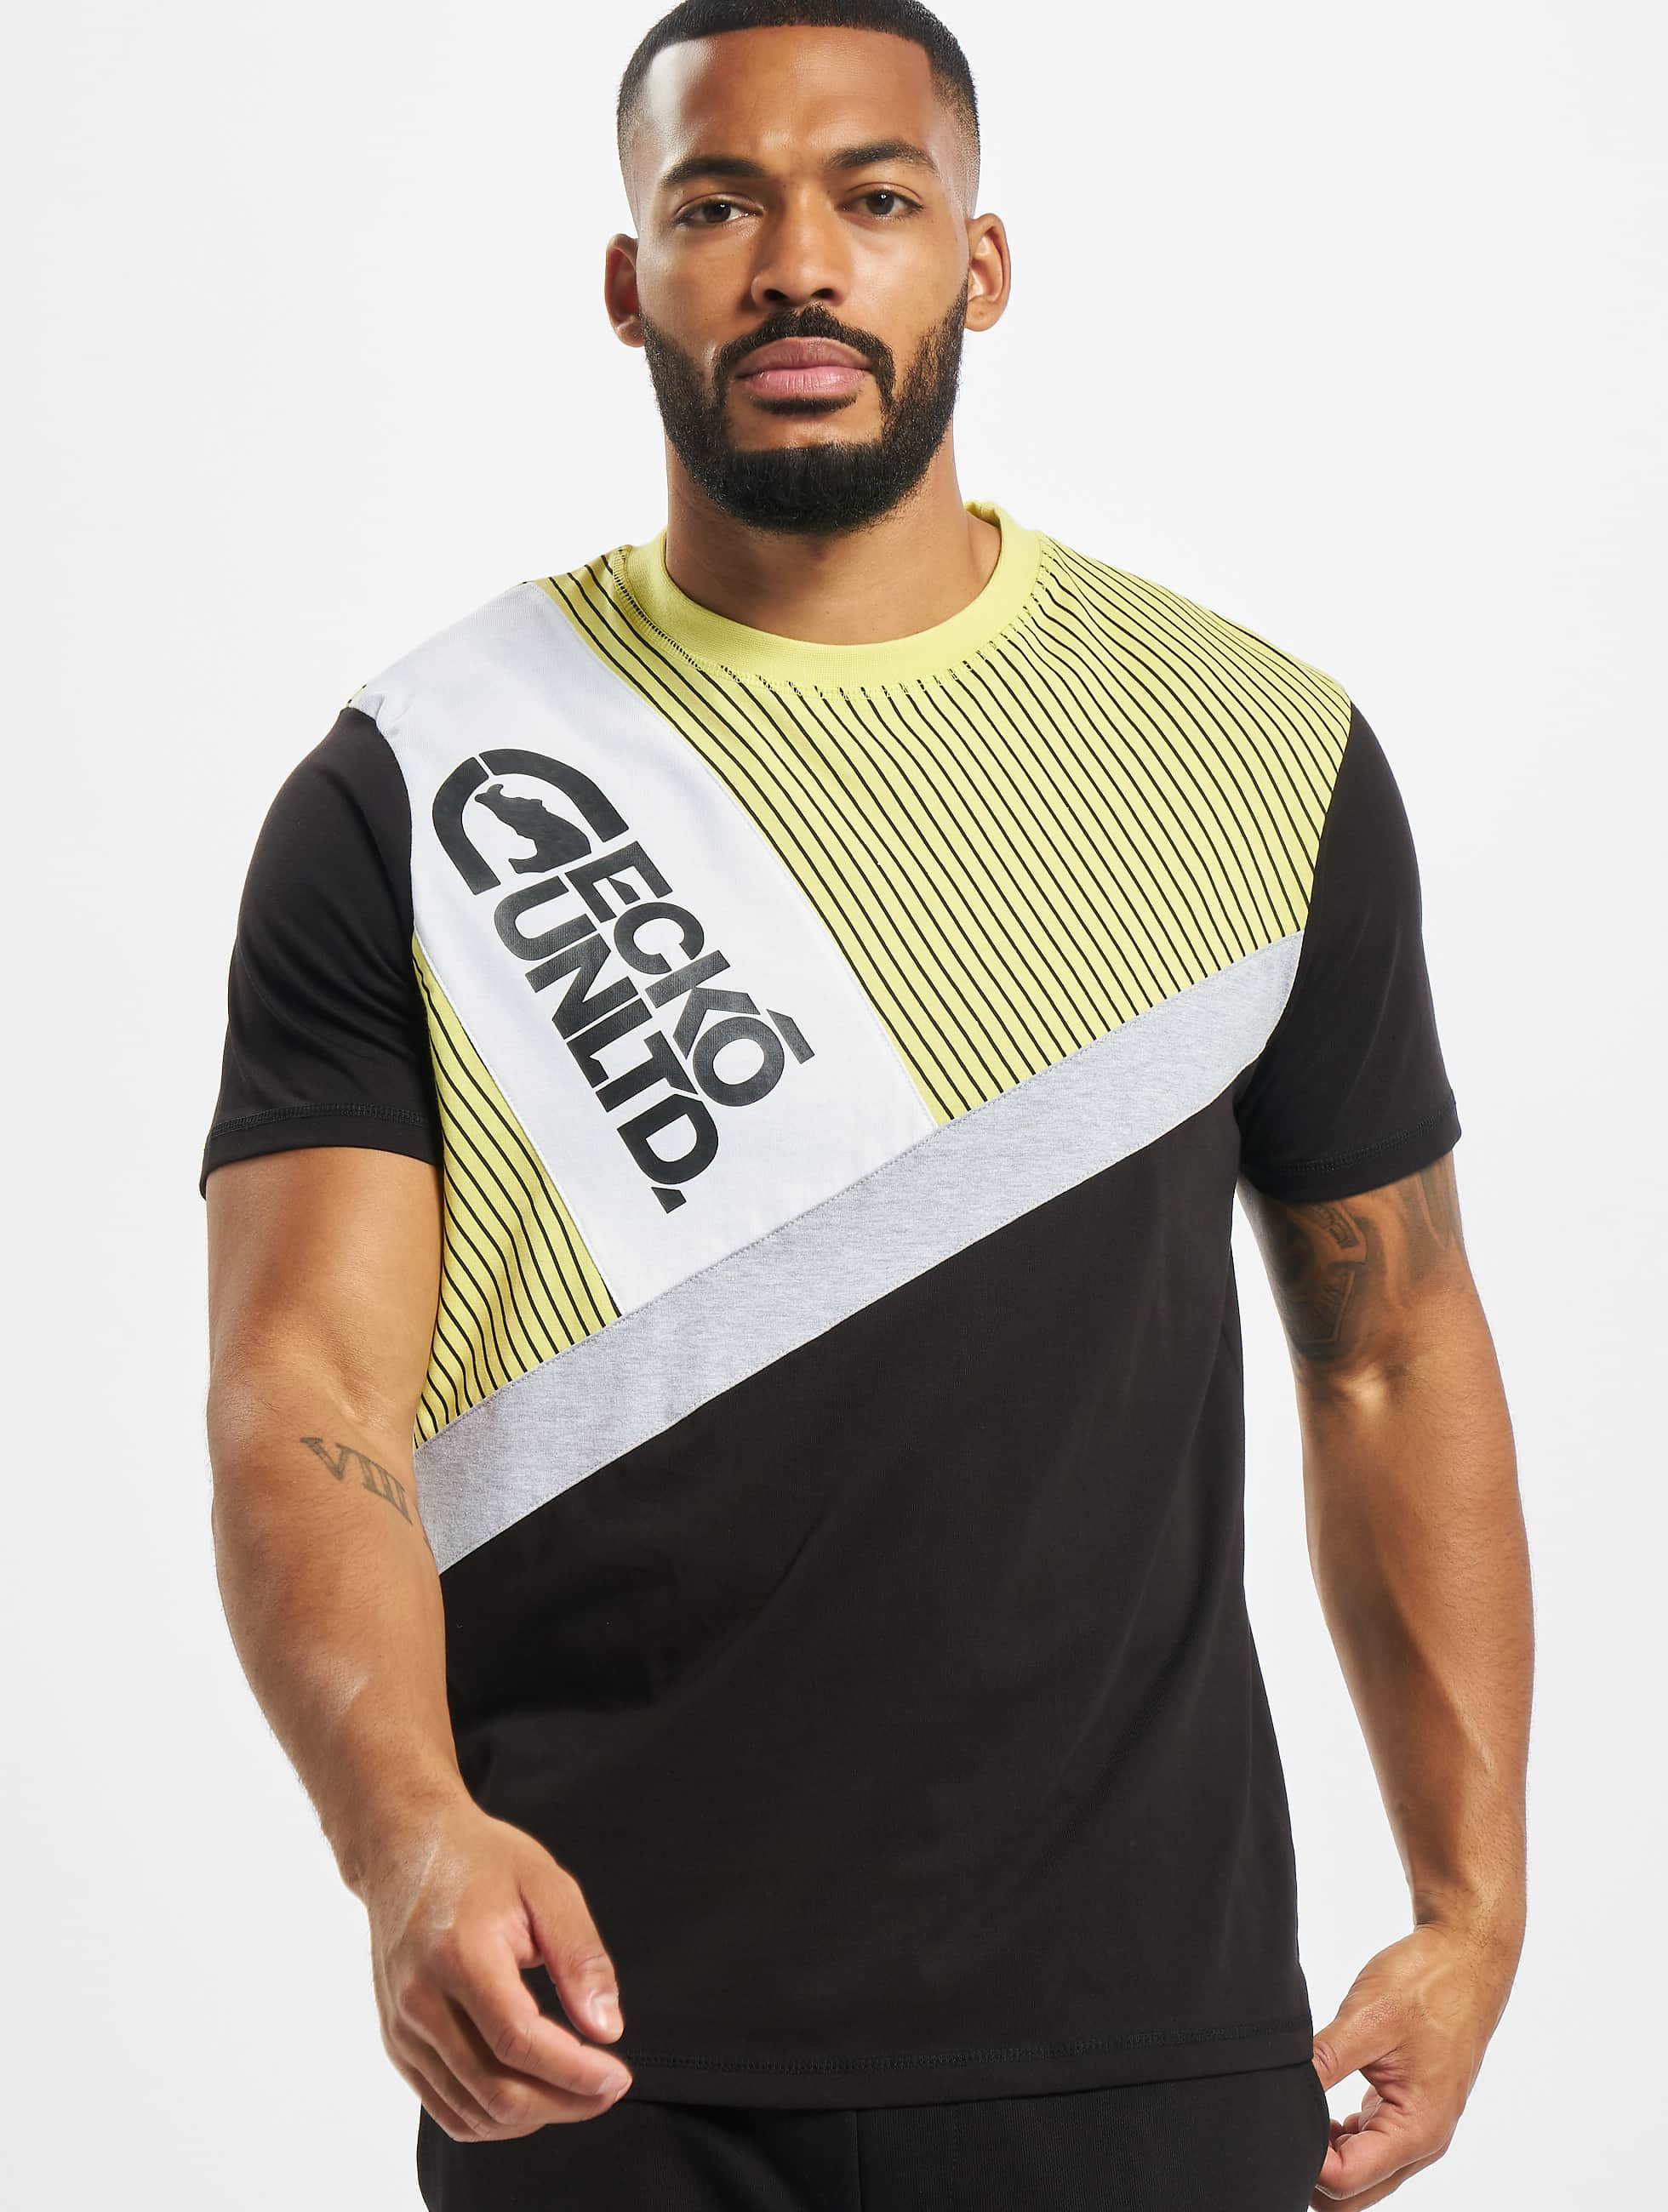 Ecko Unltd. / T-Shirt Jackson in black XL